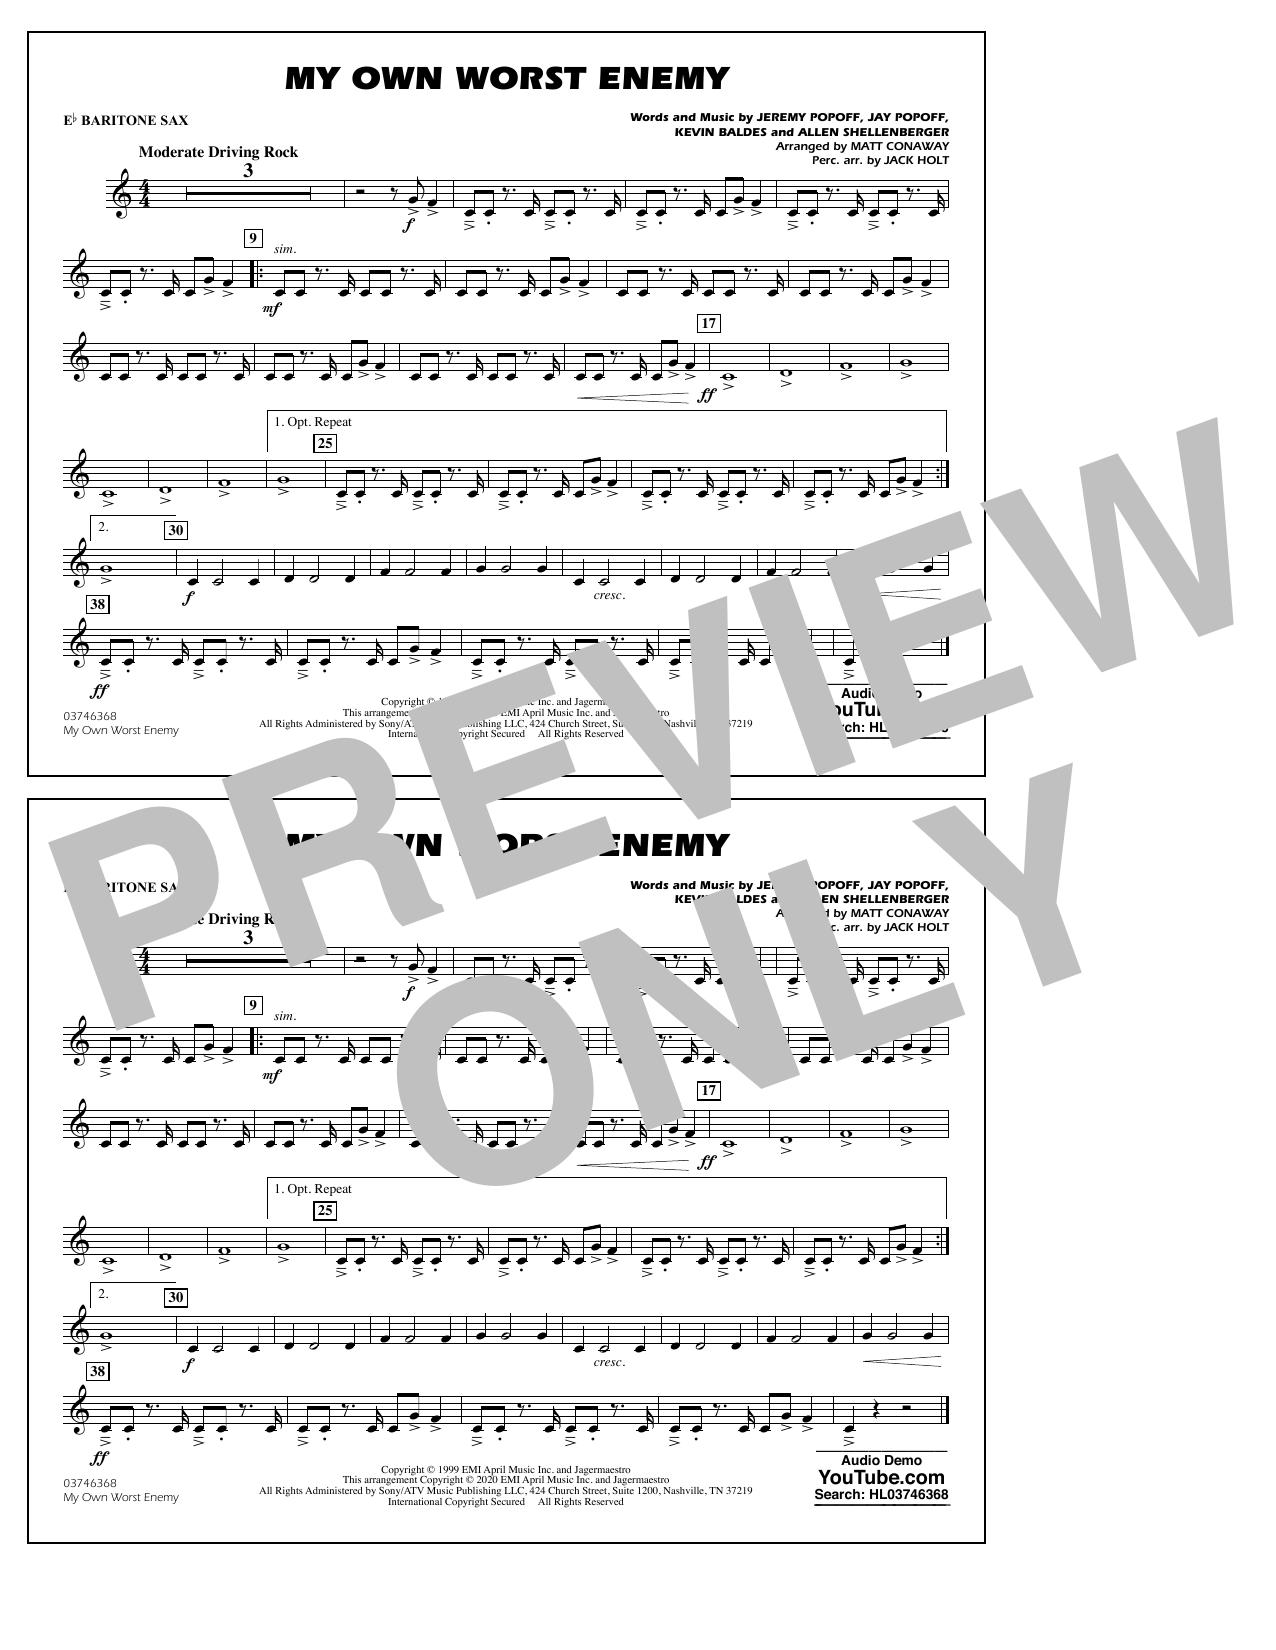 My Own Worst Enemy (arr. Matt Conaway) - Eb Baritone Sax Sheet Music